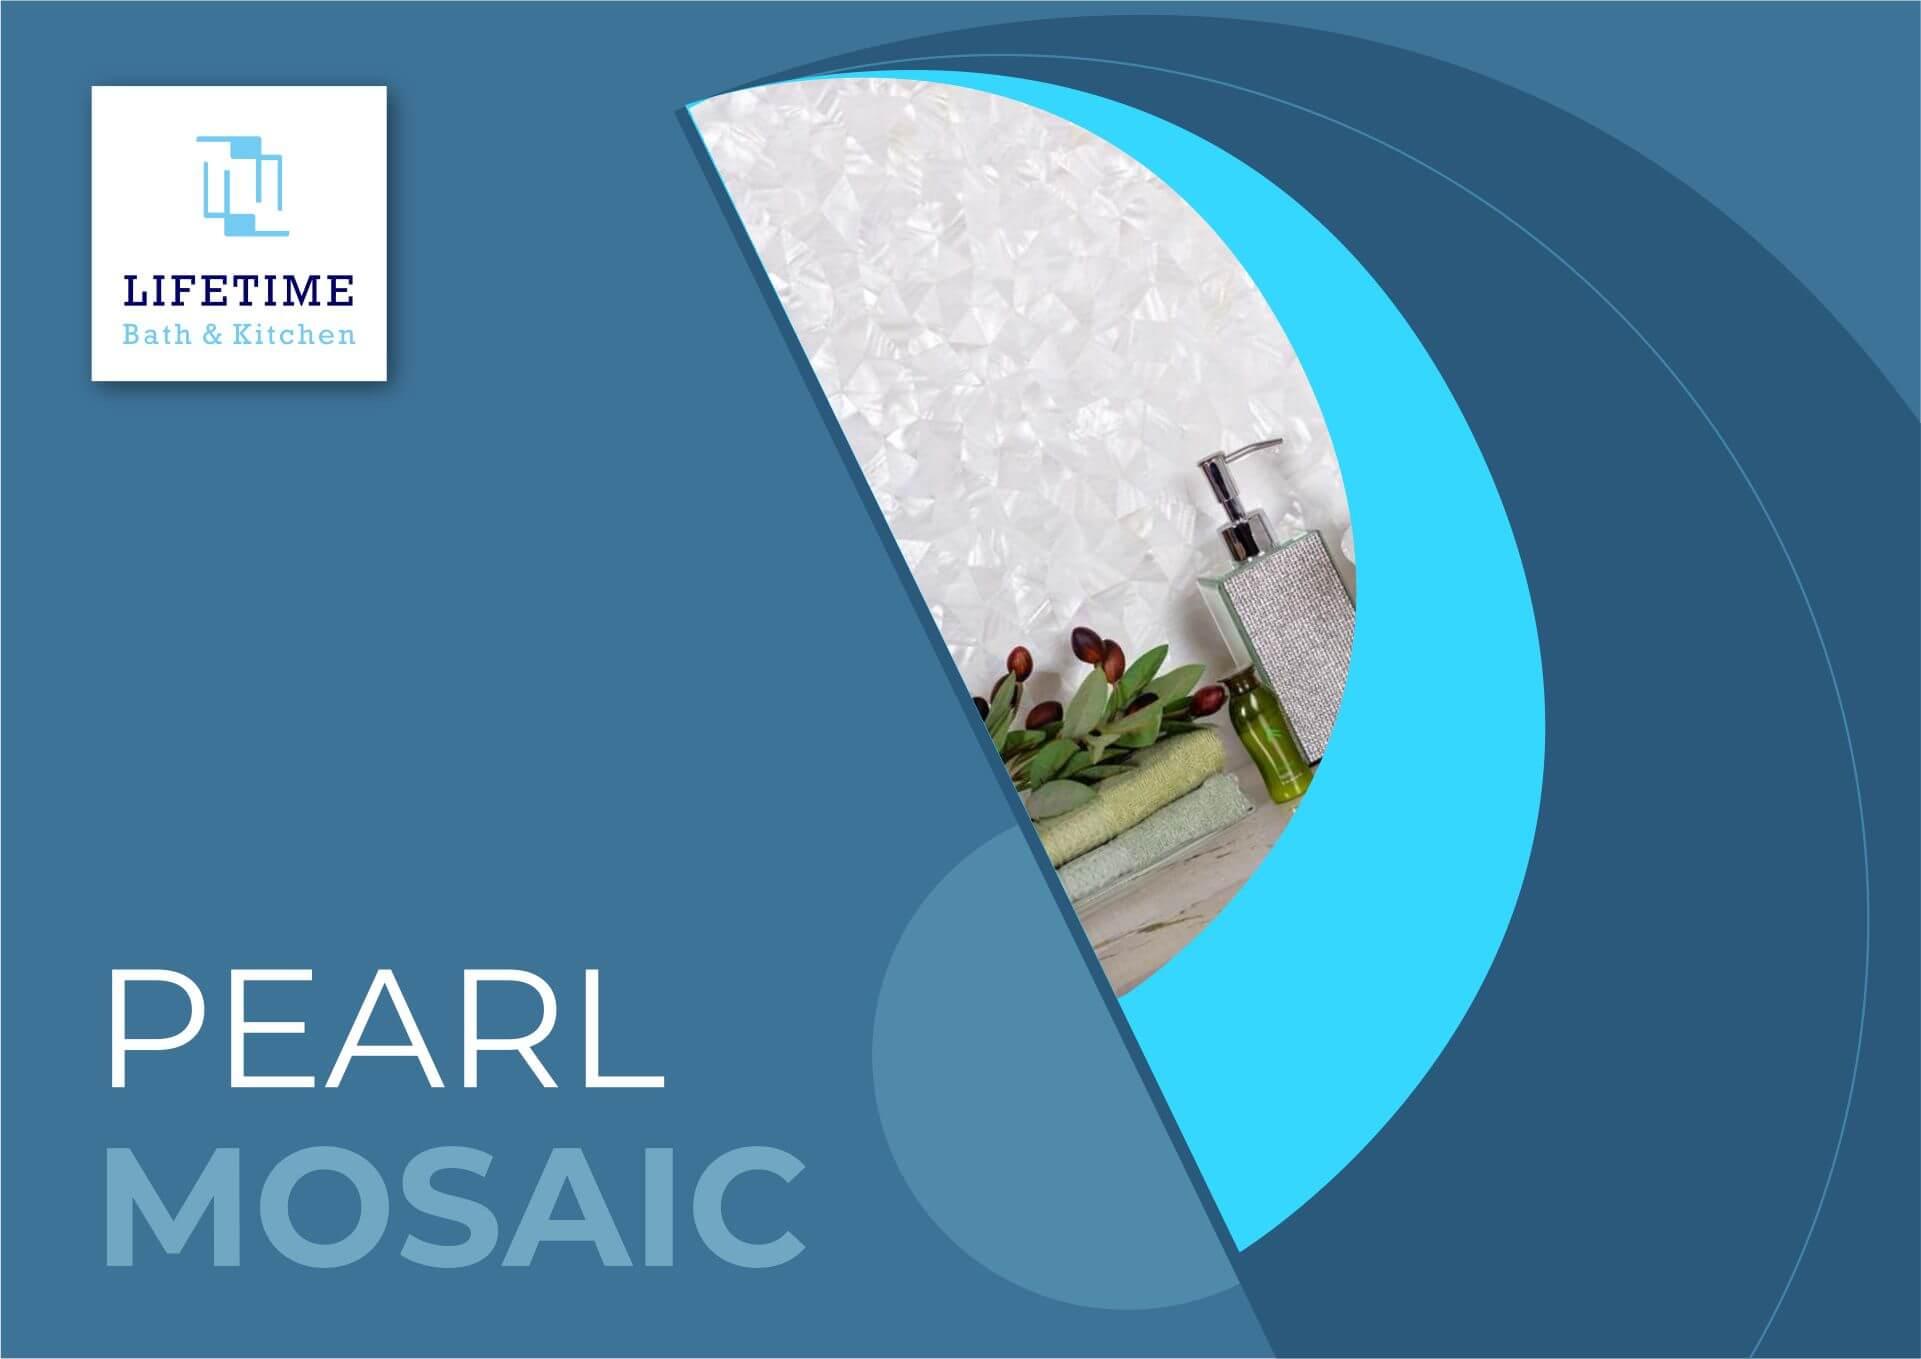 Pearl-Mosaic-page (2)